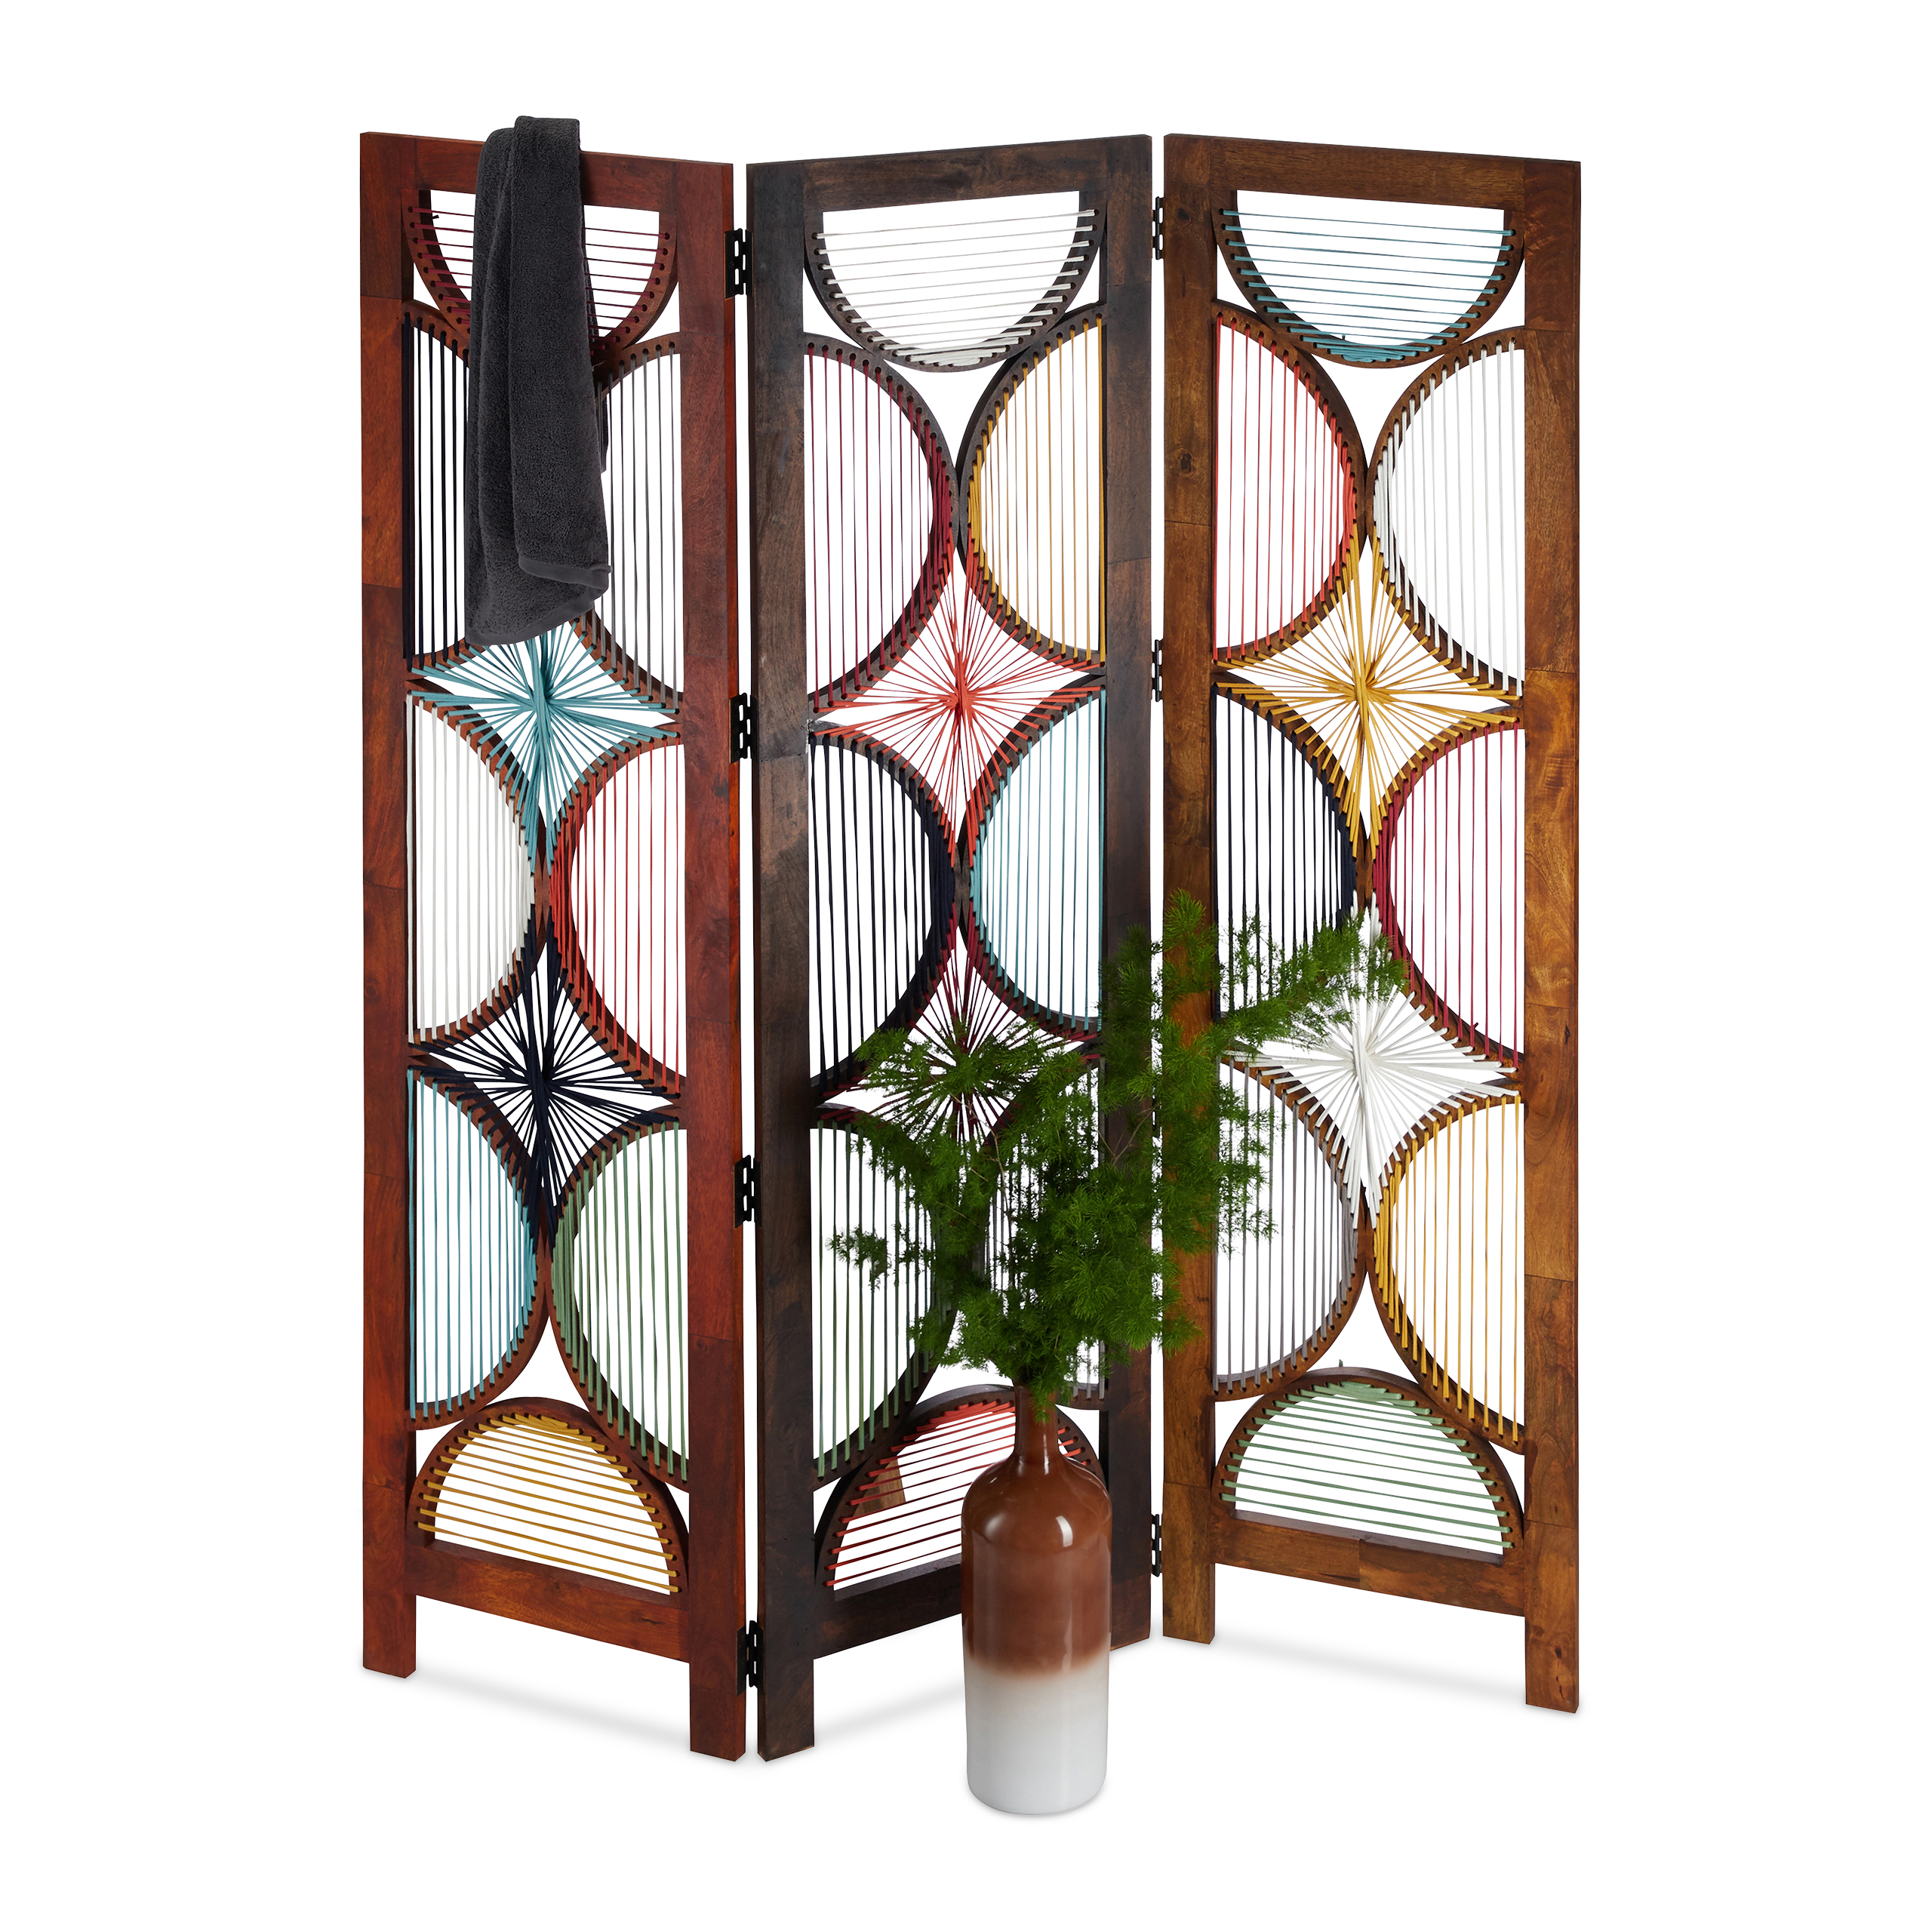 Full Size of Trennwand Spanische Wand Raumtrenner Paravent Bambus 4 Teilig 180 Garten Bett Wohnzimmer Paravent Bambus